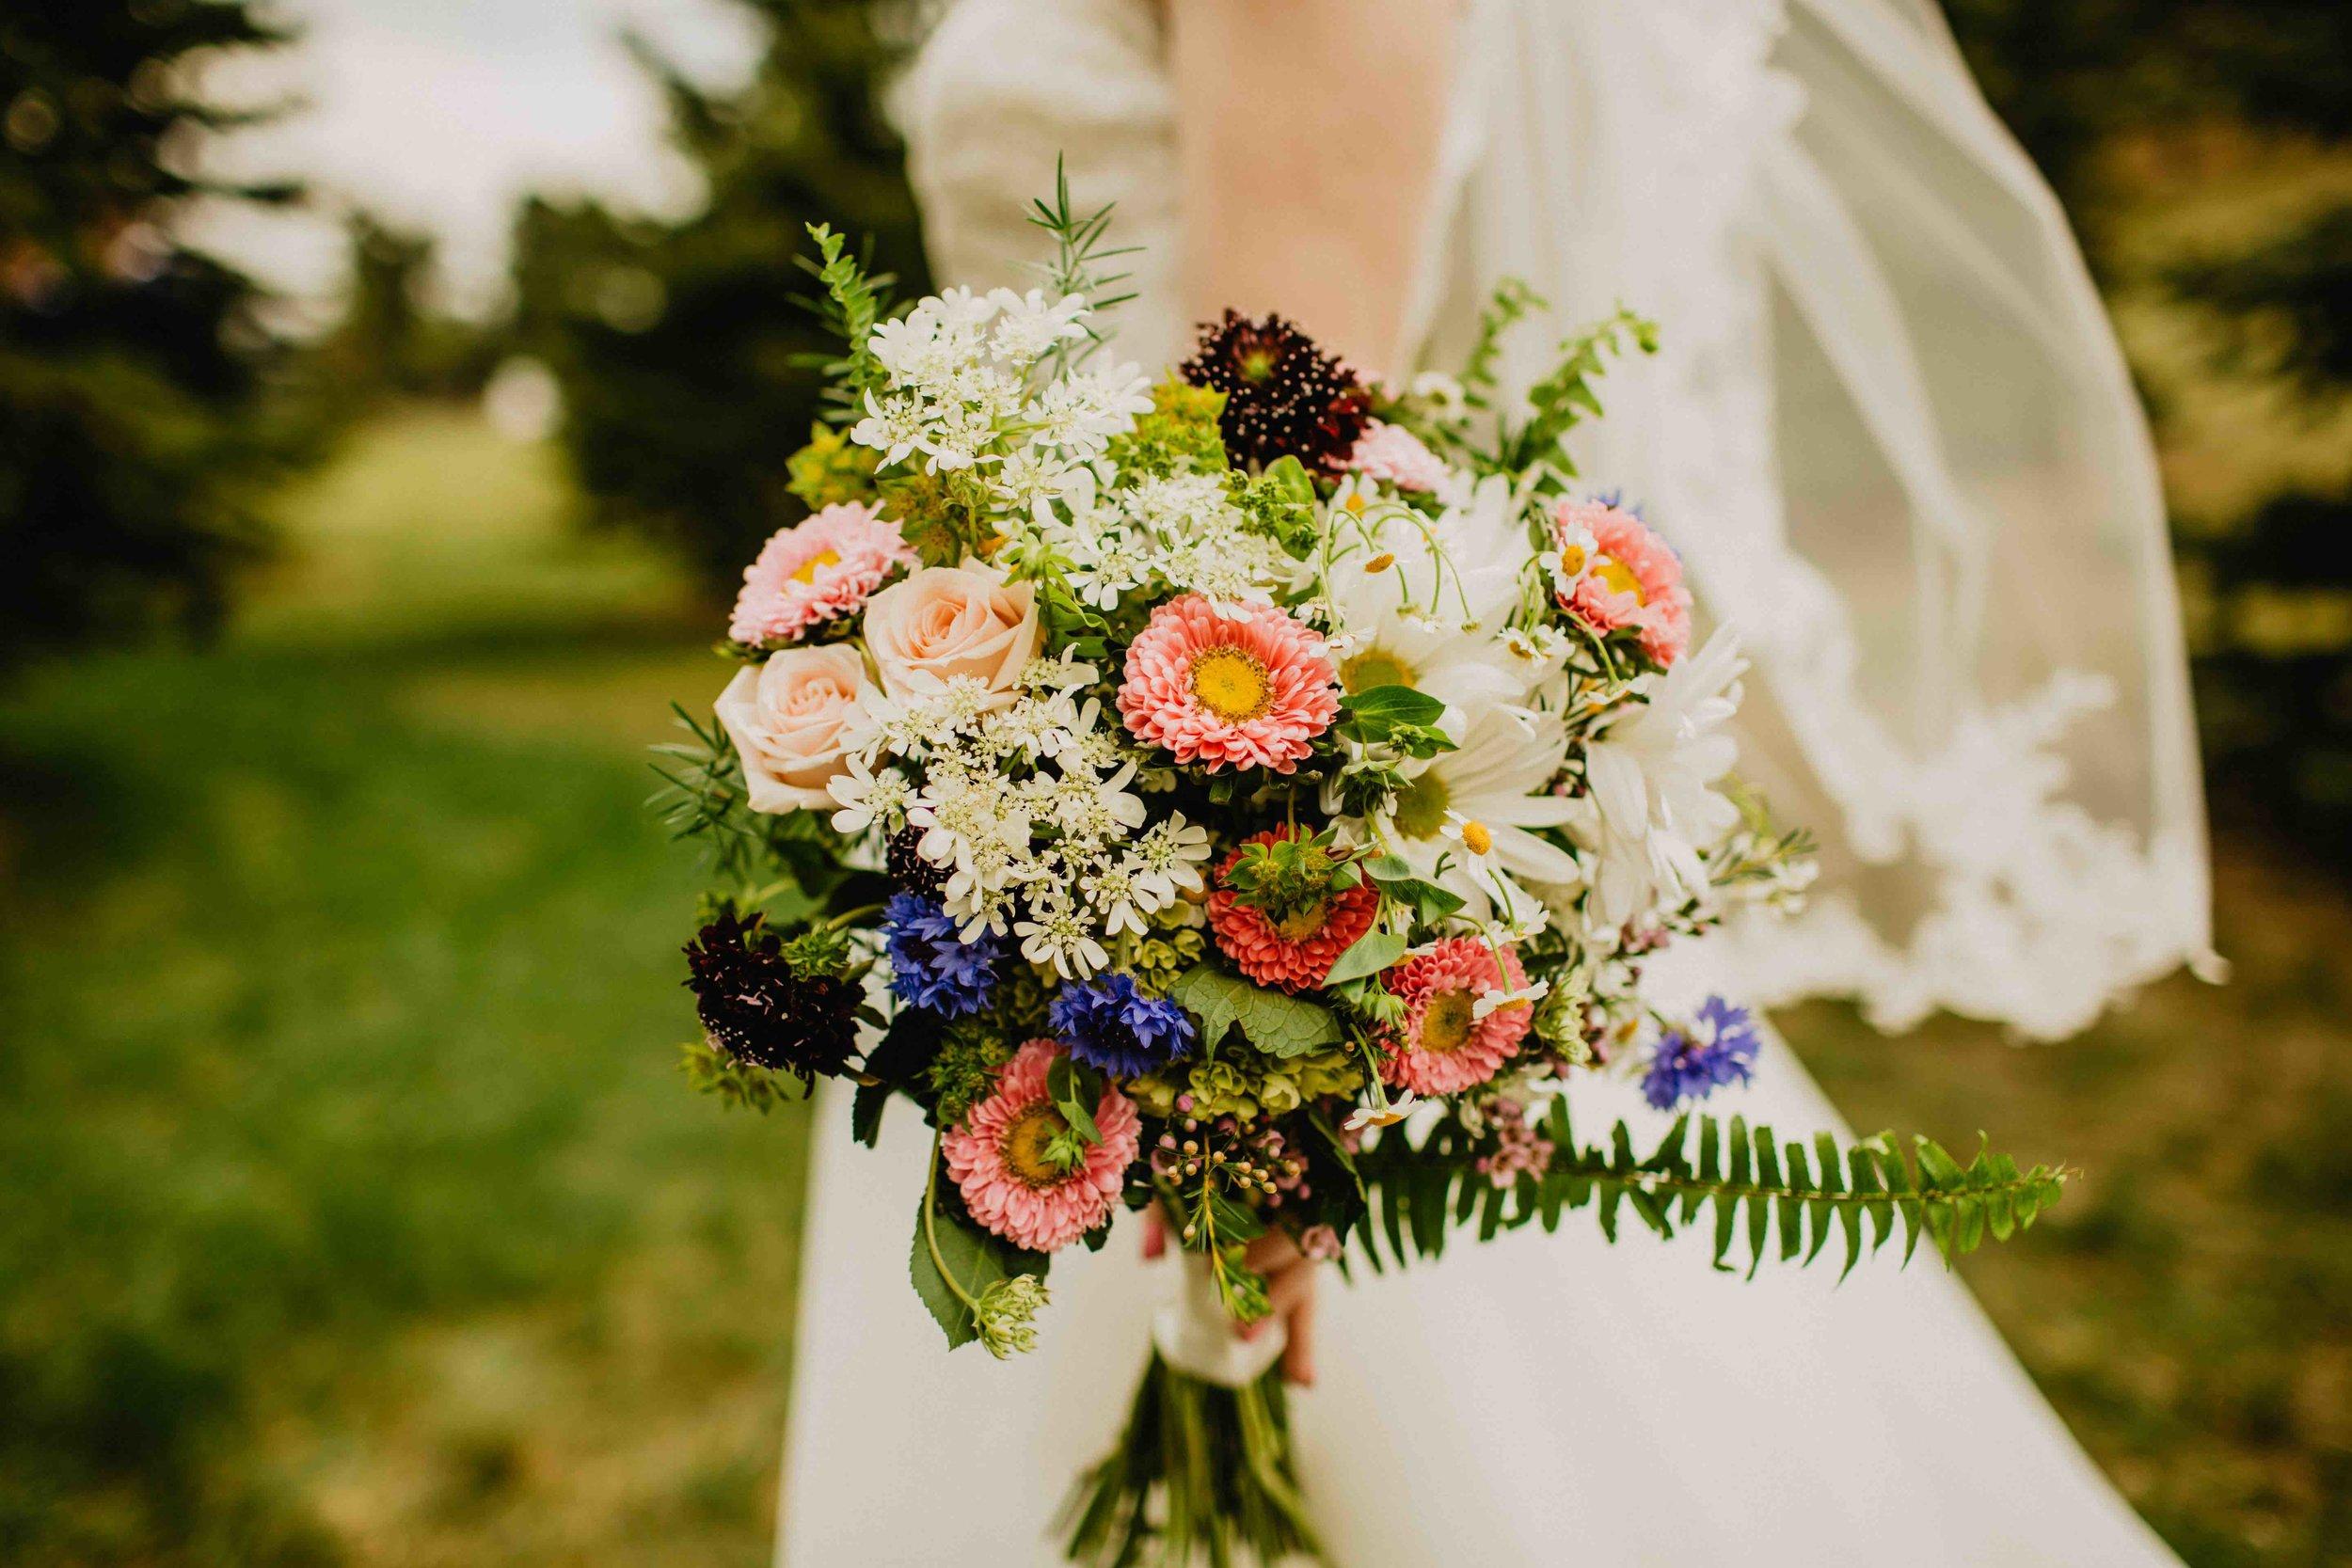 607A5852-colorado-wedding-photographer-denver-springs-vail--colorado-wedding-photographer-denver-springs-vail-.jpeg